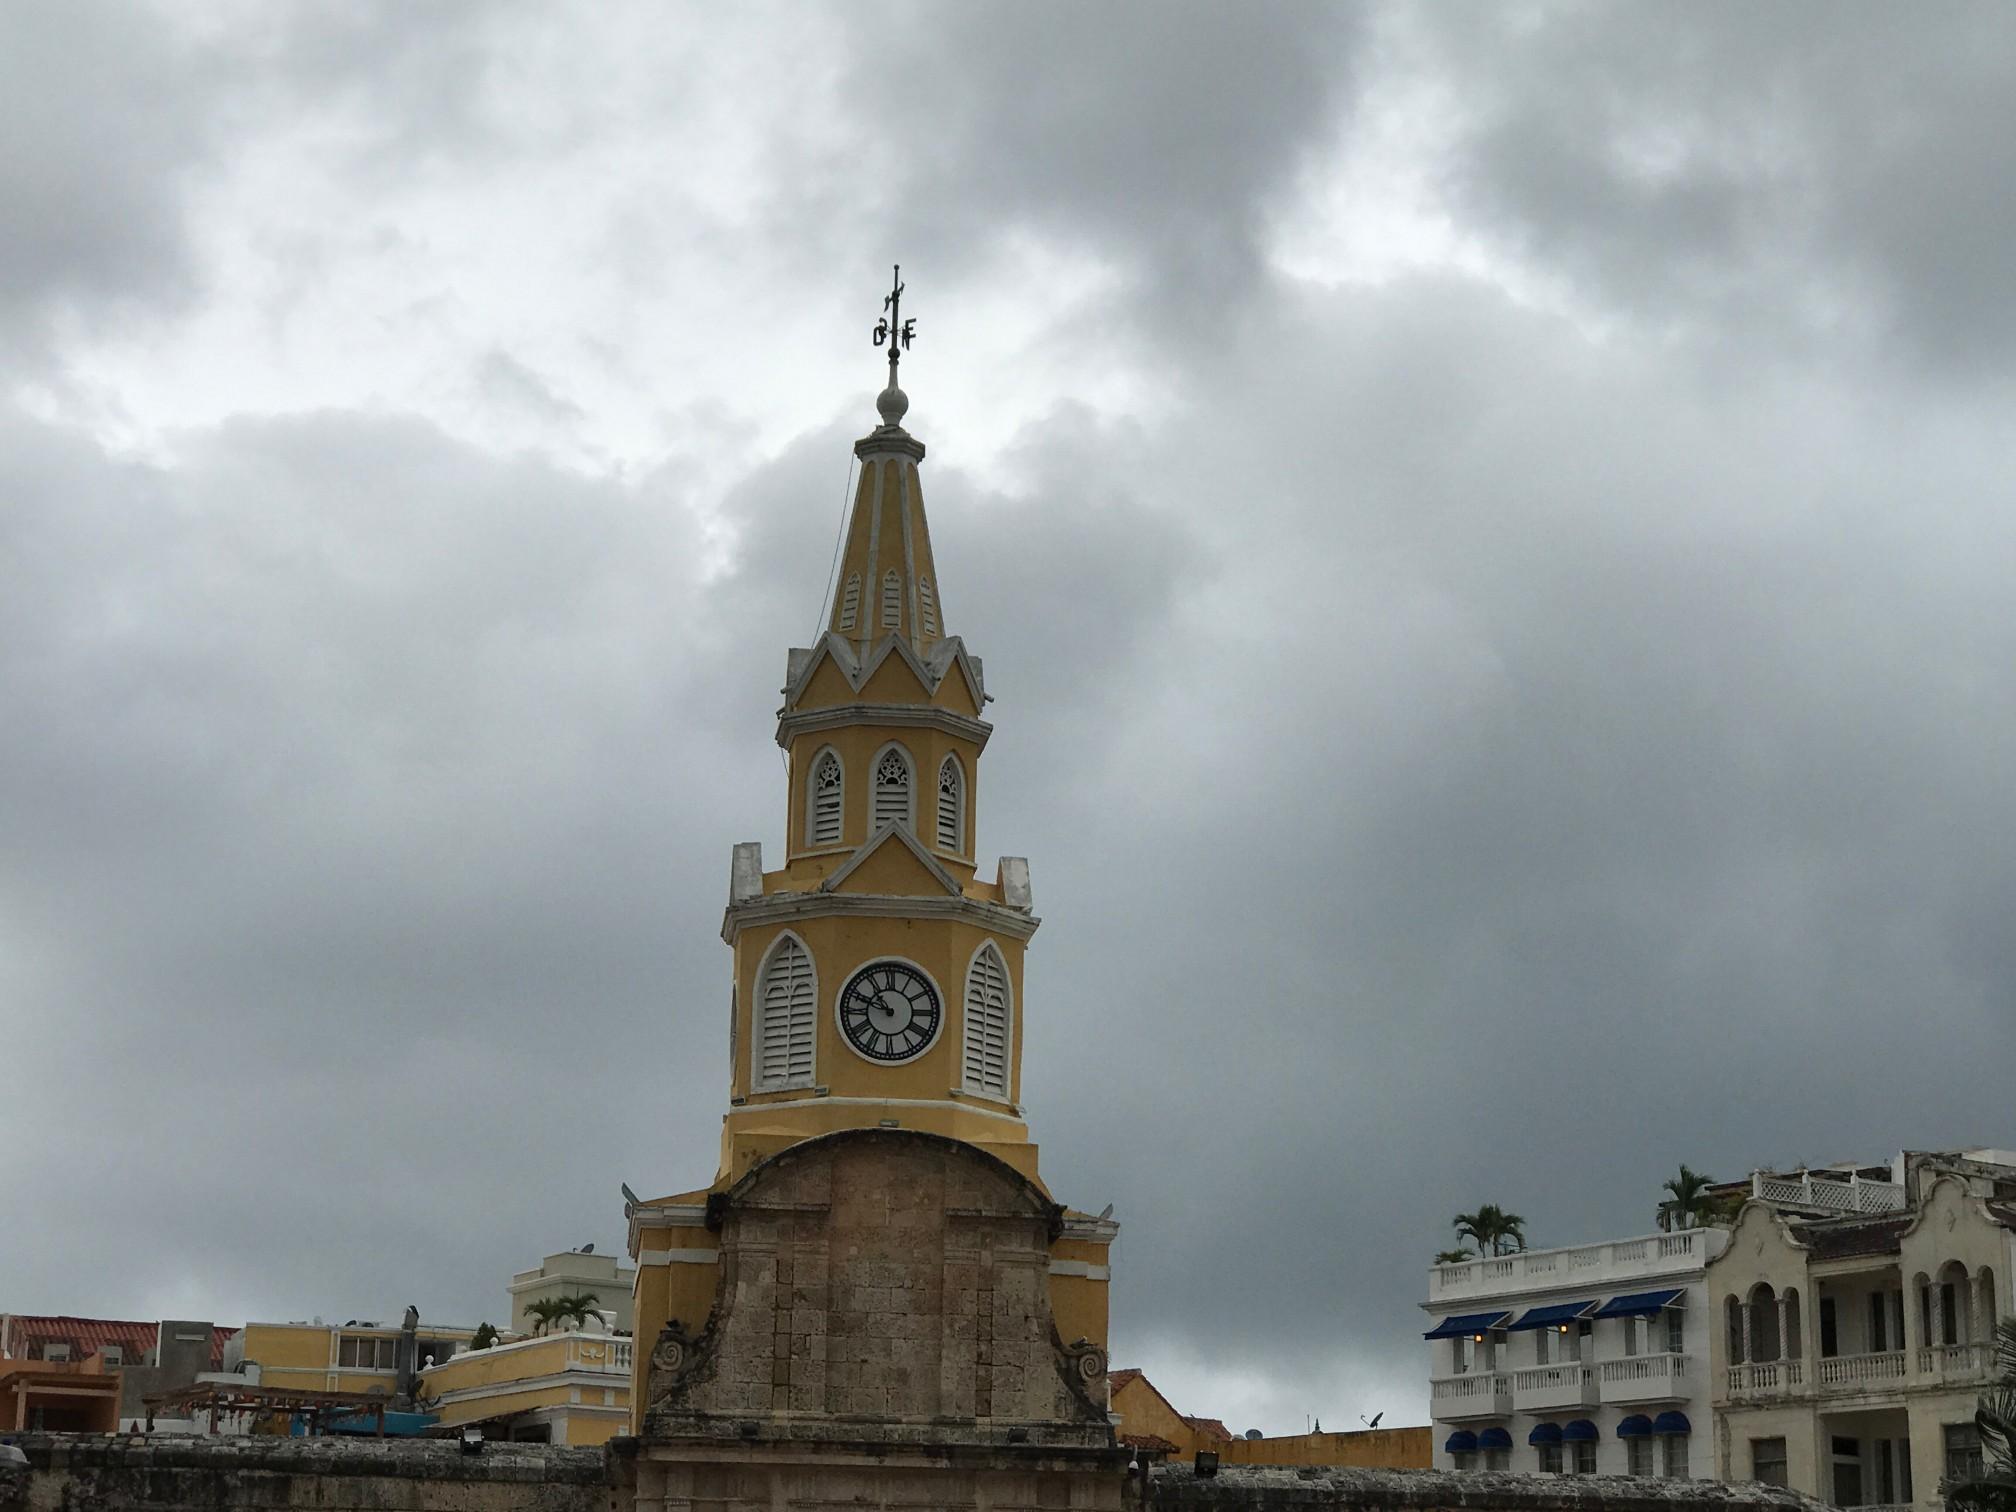 clock tower 6pm.jpg